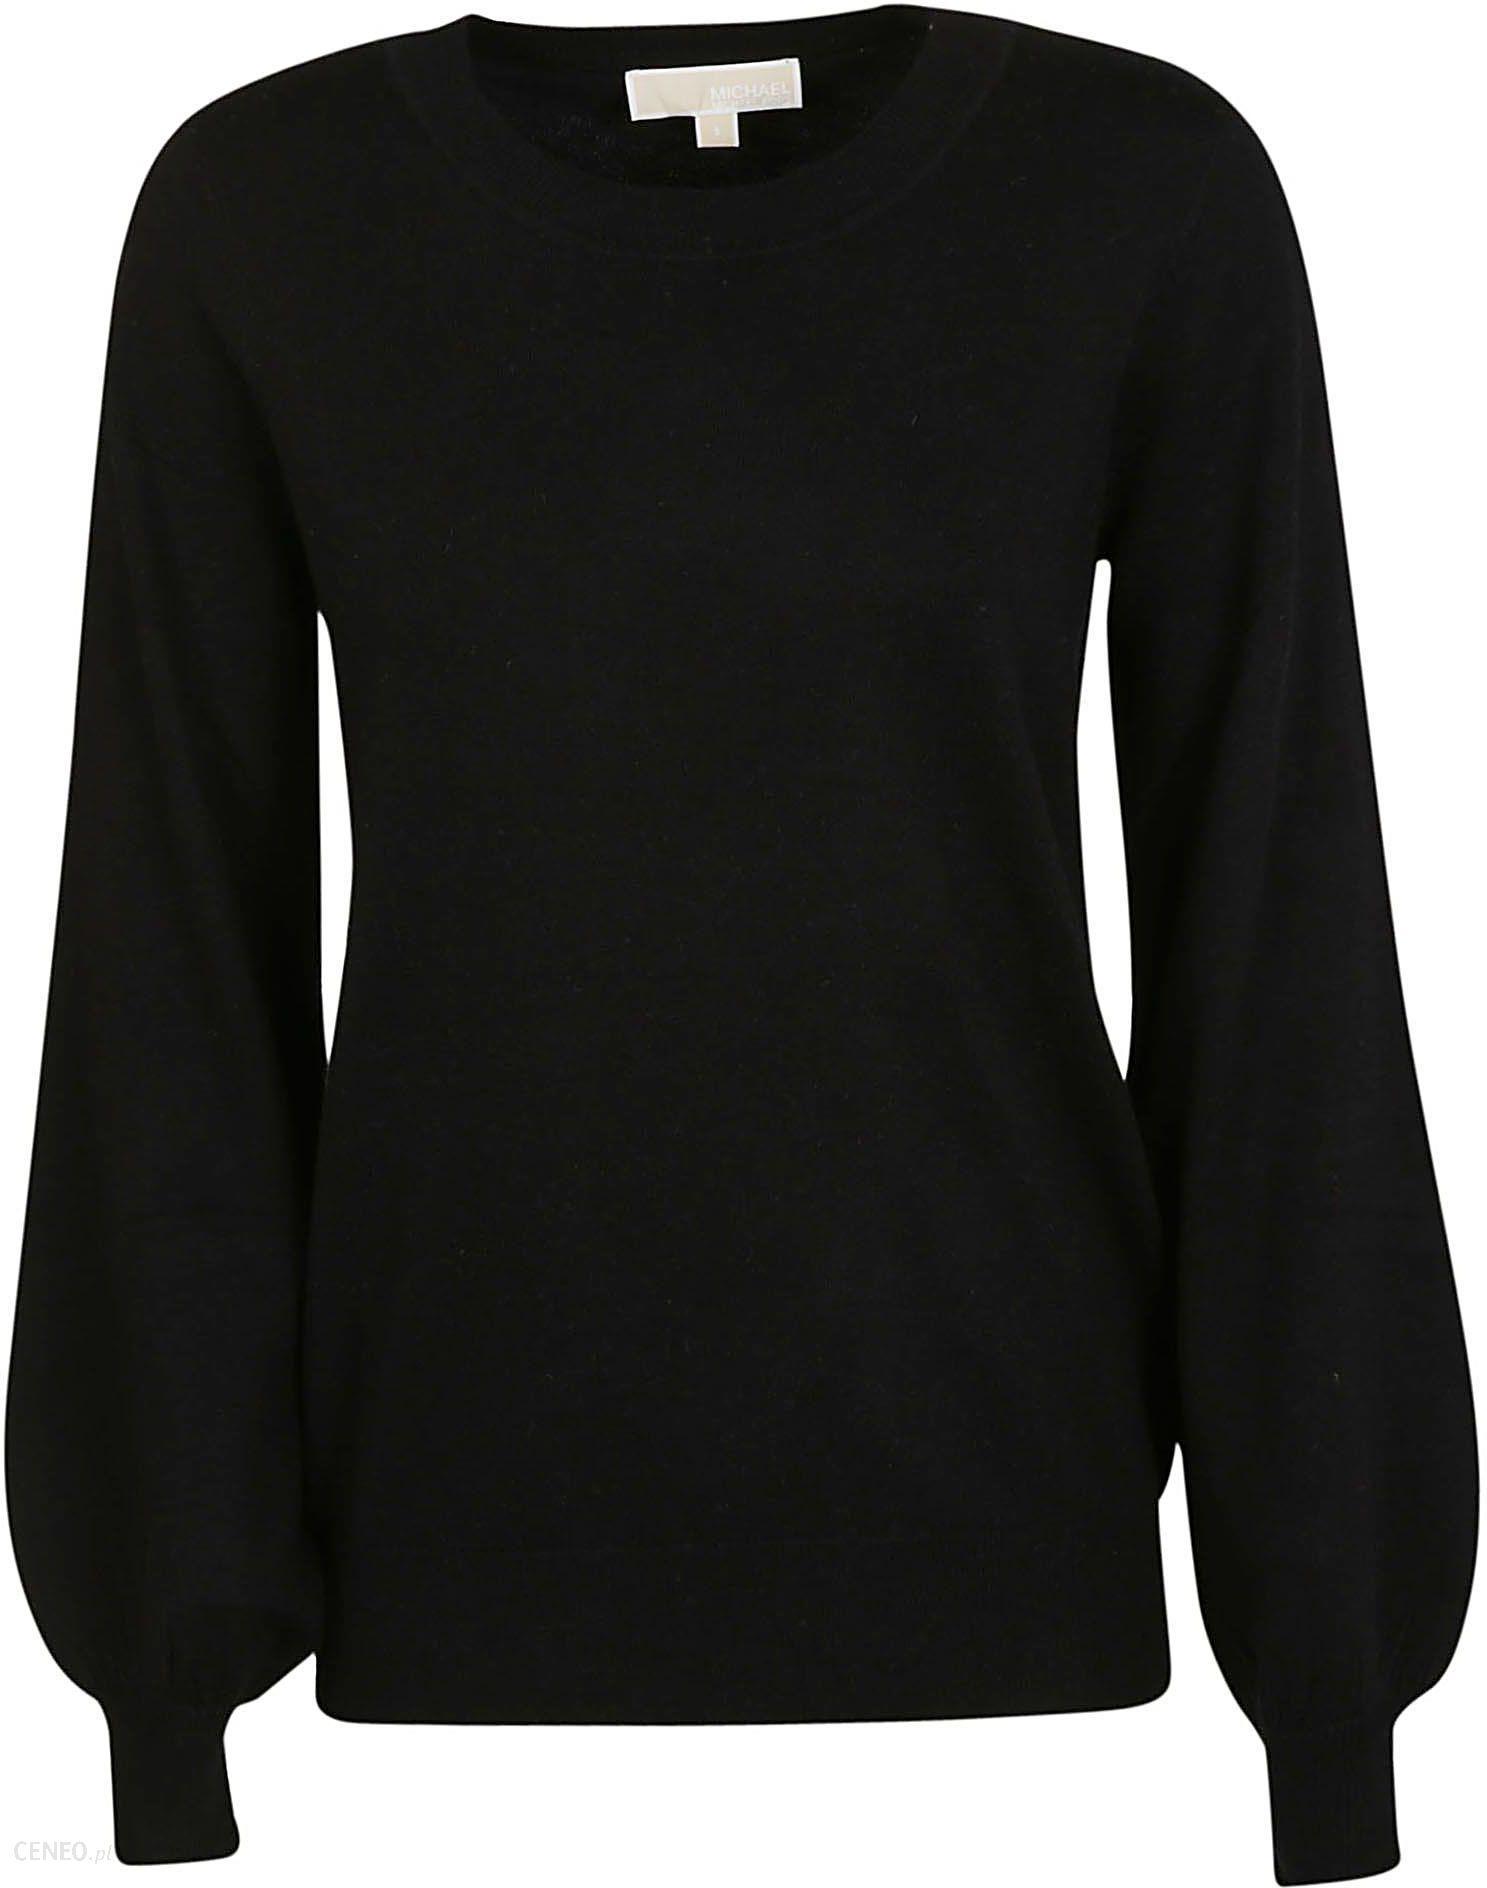 bluza koszulka top rozcięta na plecach czarna